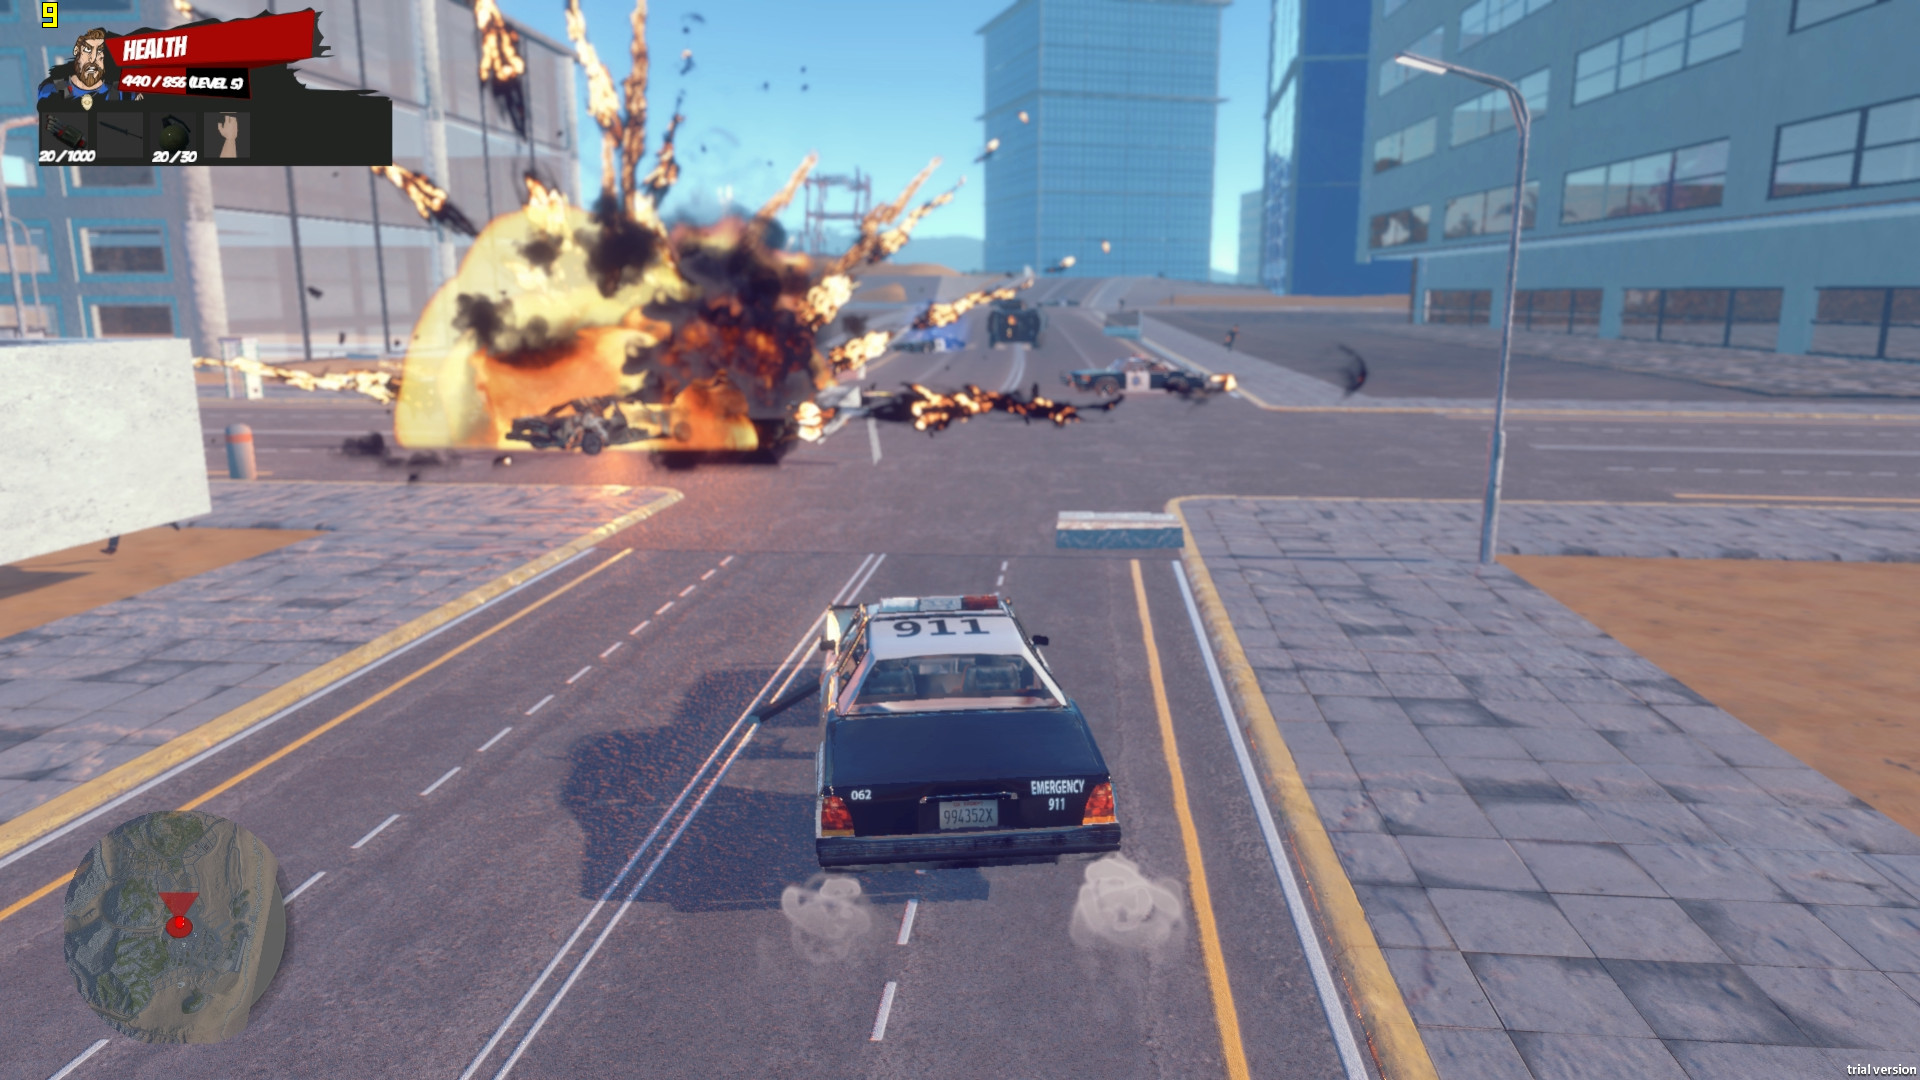 [Image: Explosion.jpg]